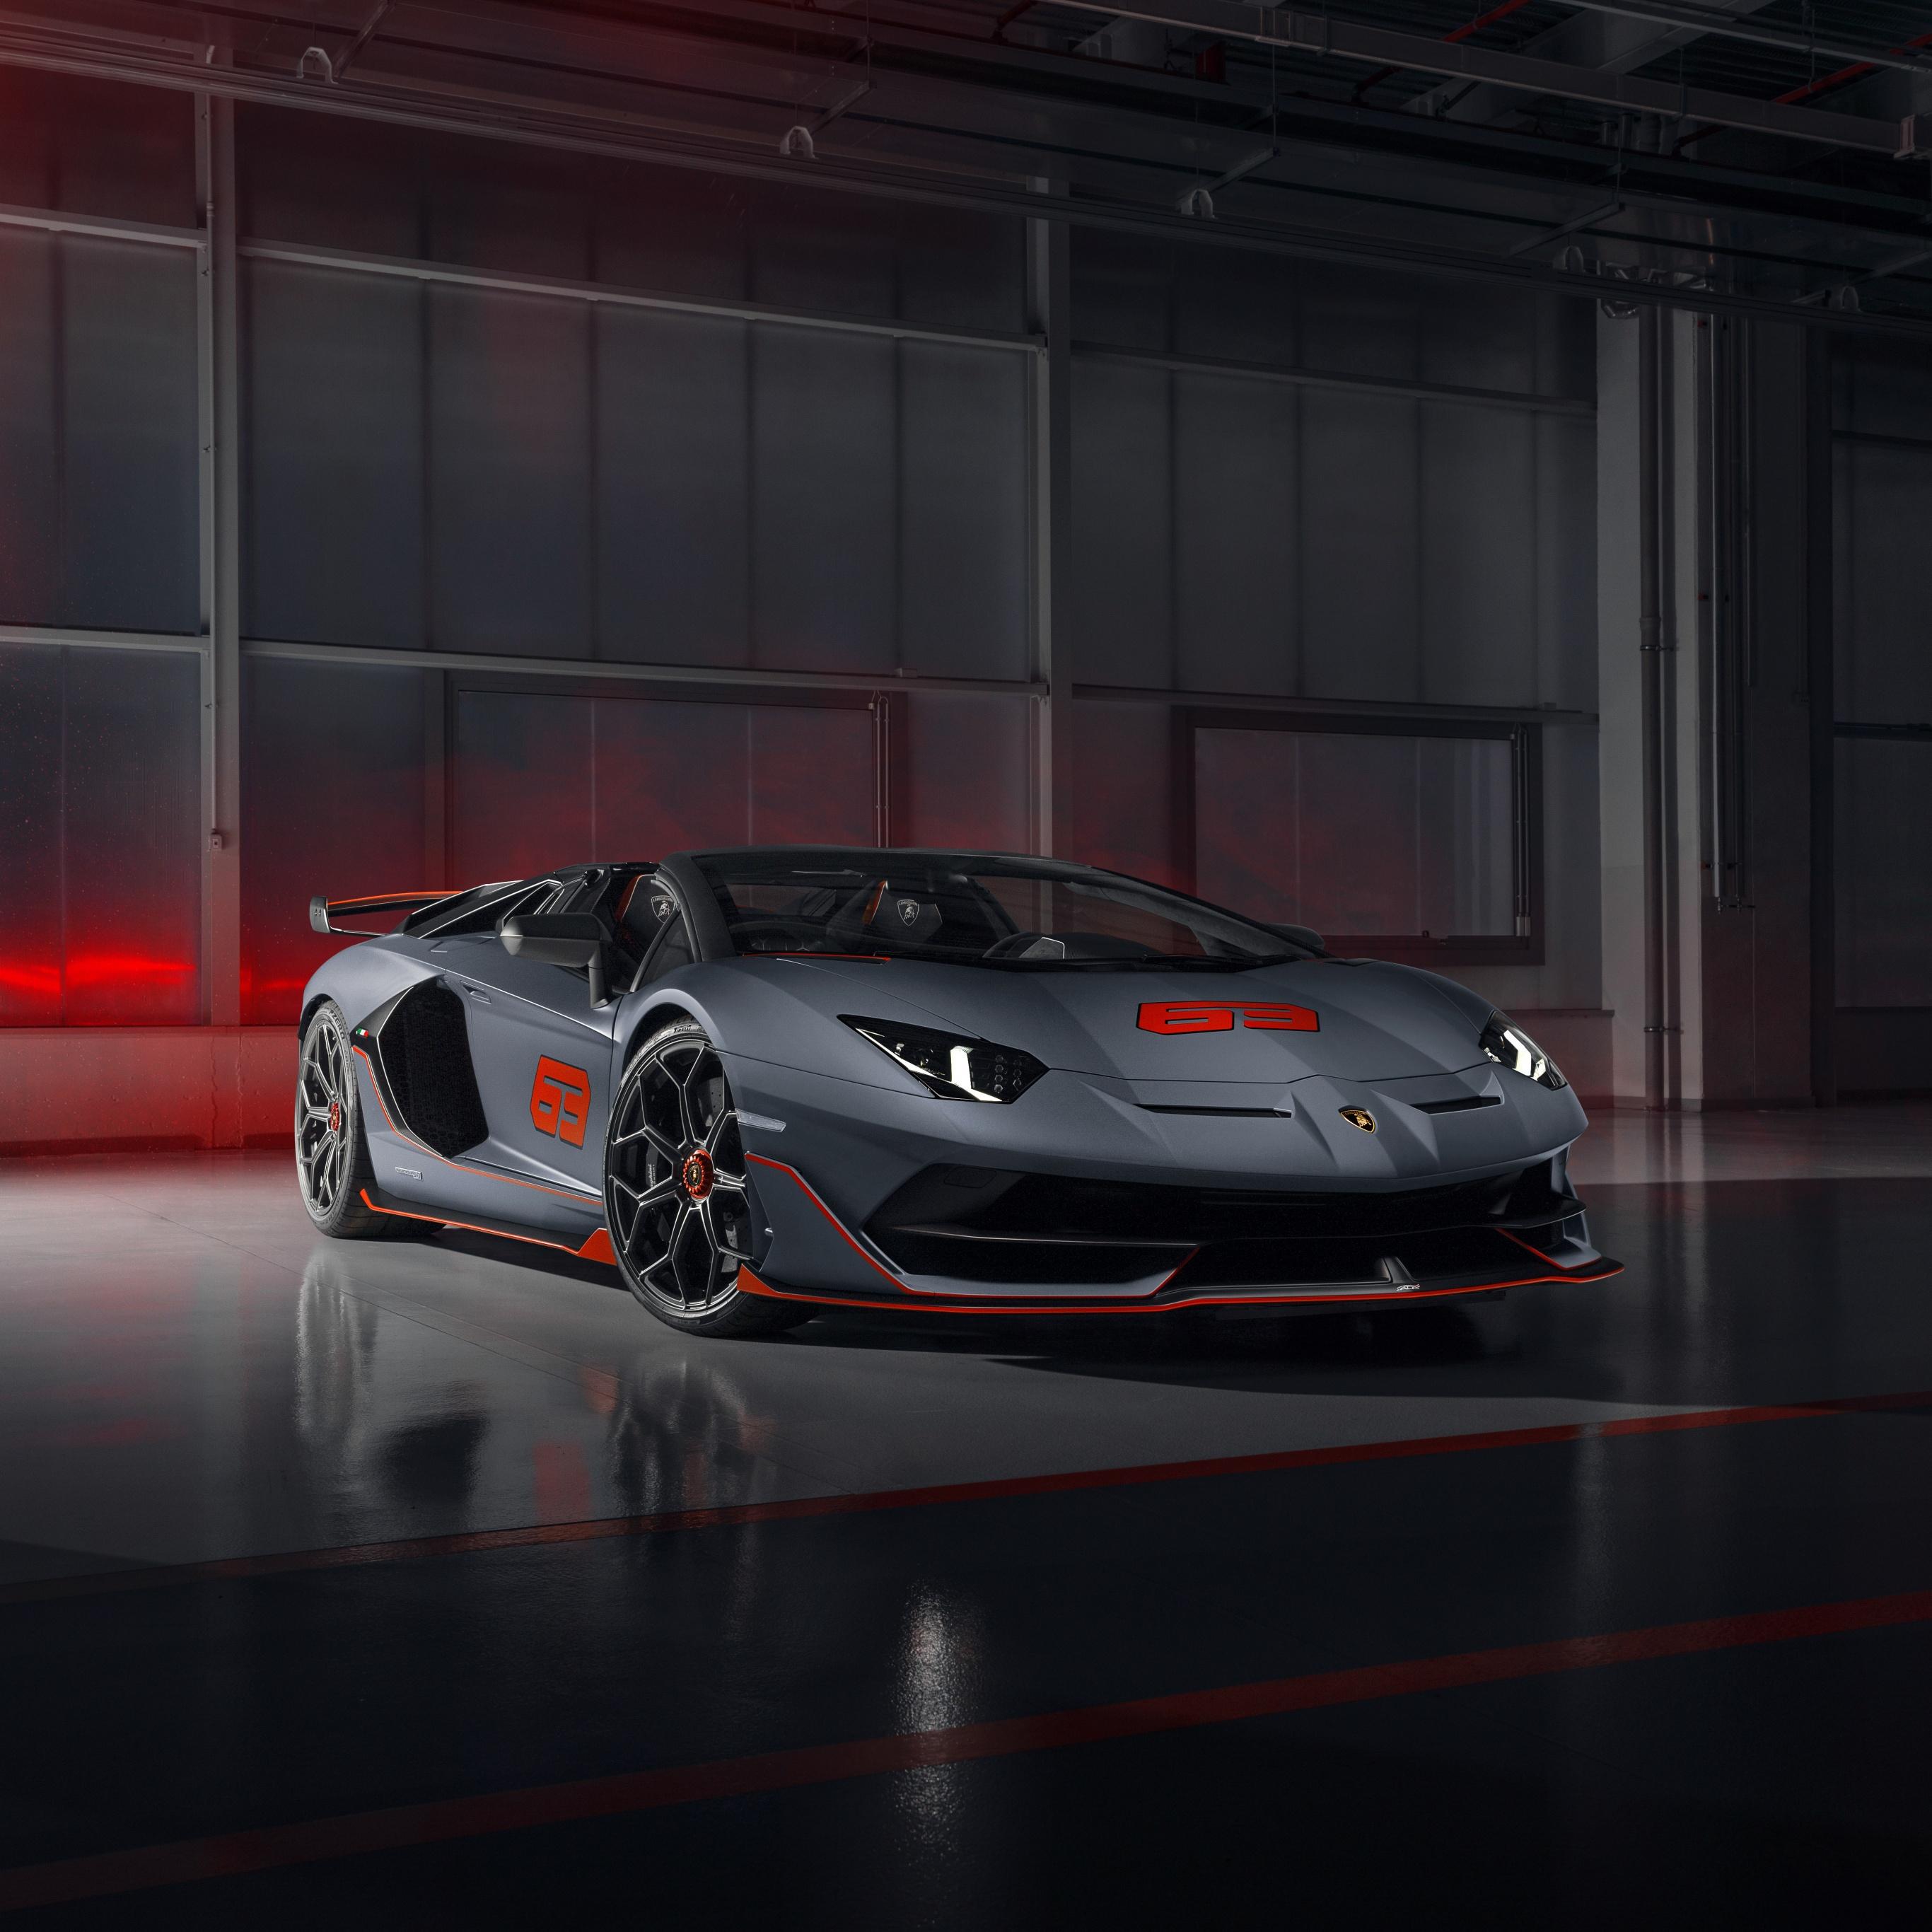 Lamborghini Aventador Svj 4k Wallpaper 5k 8k 2020 Cars 862